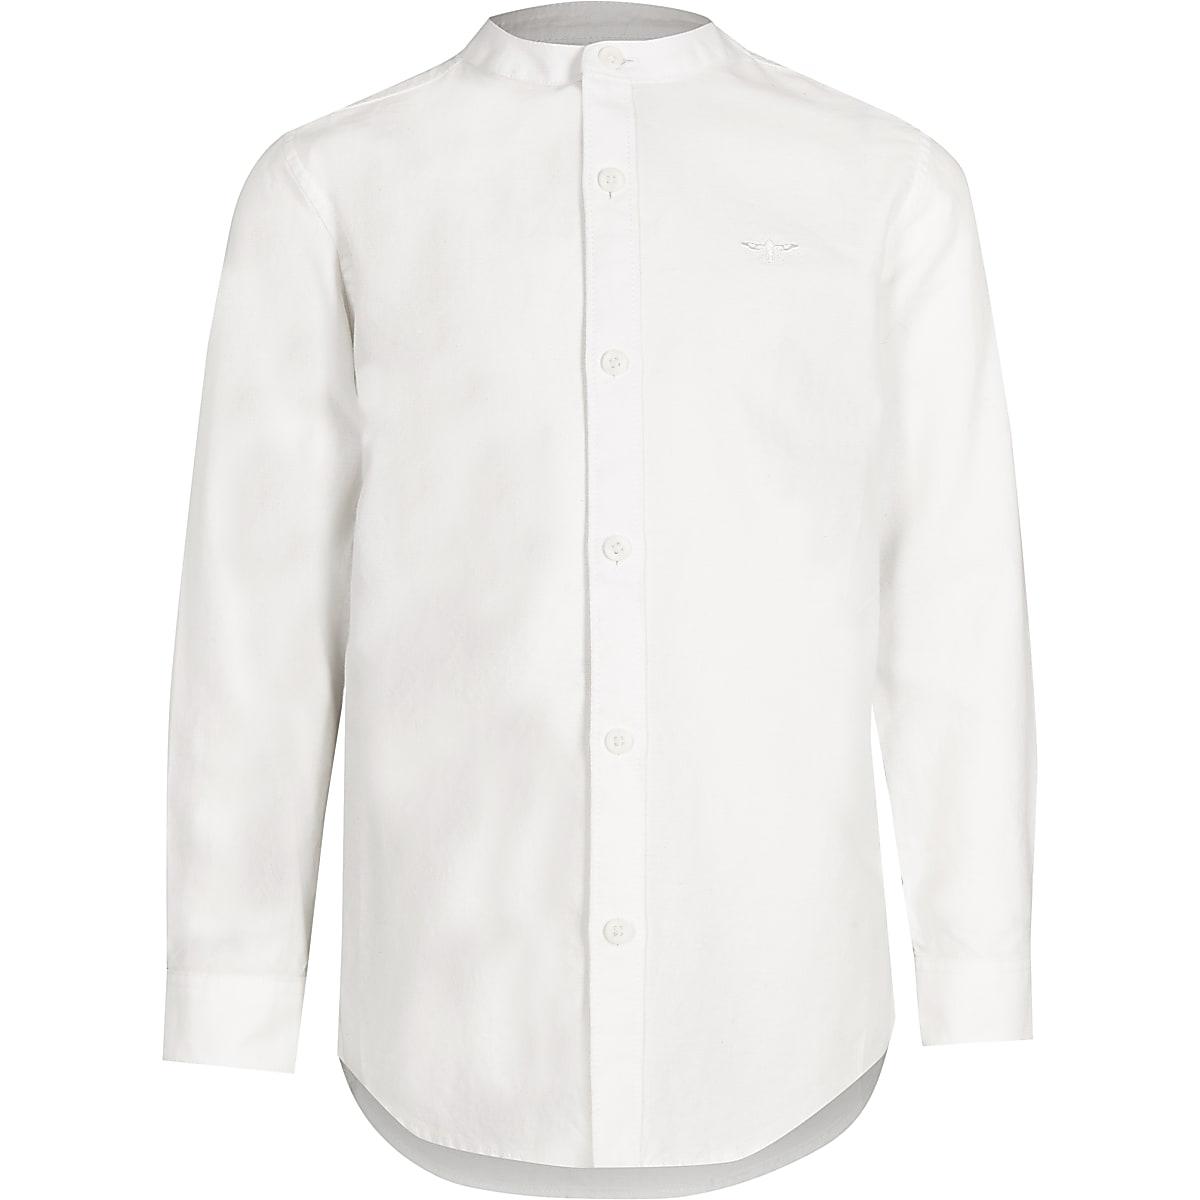 Boys white wasp embroidered grandad shirt